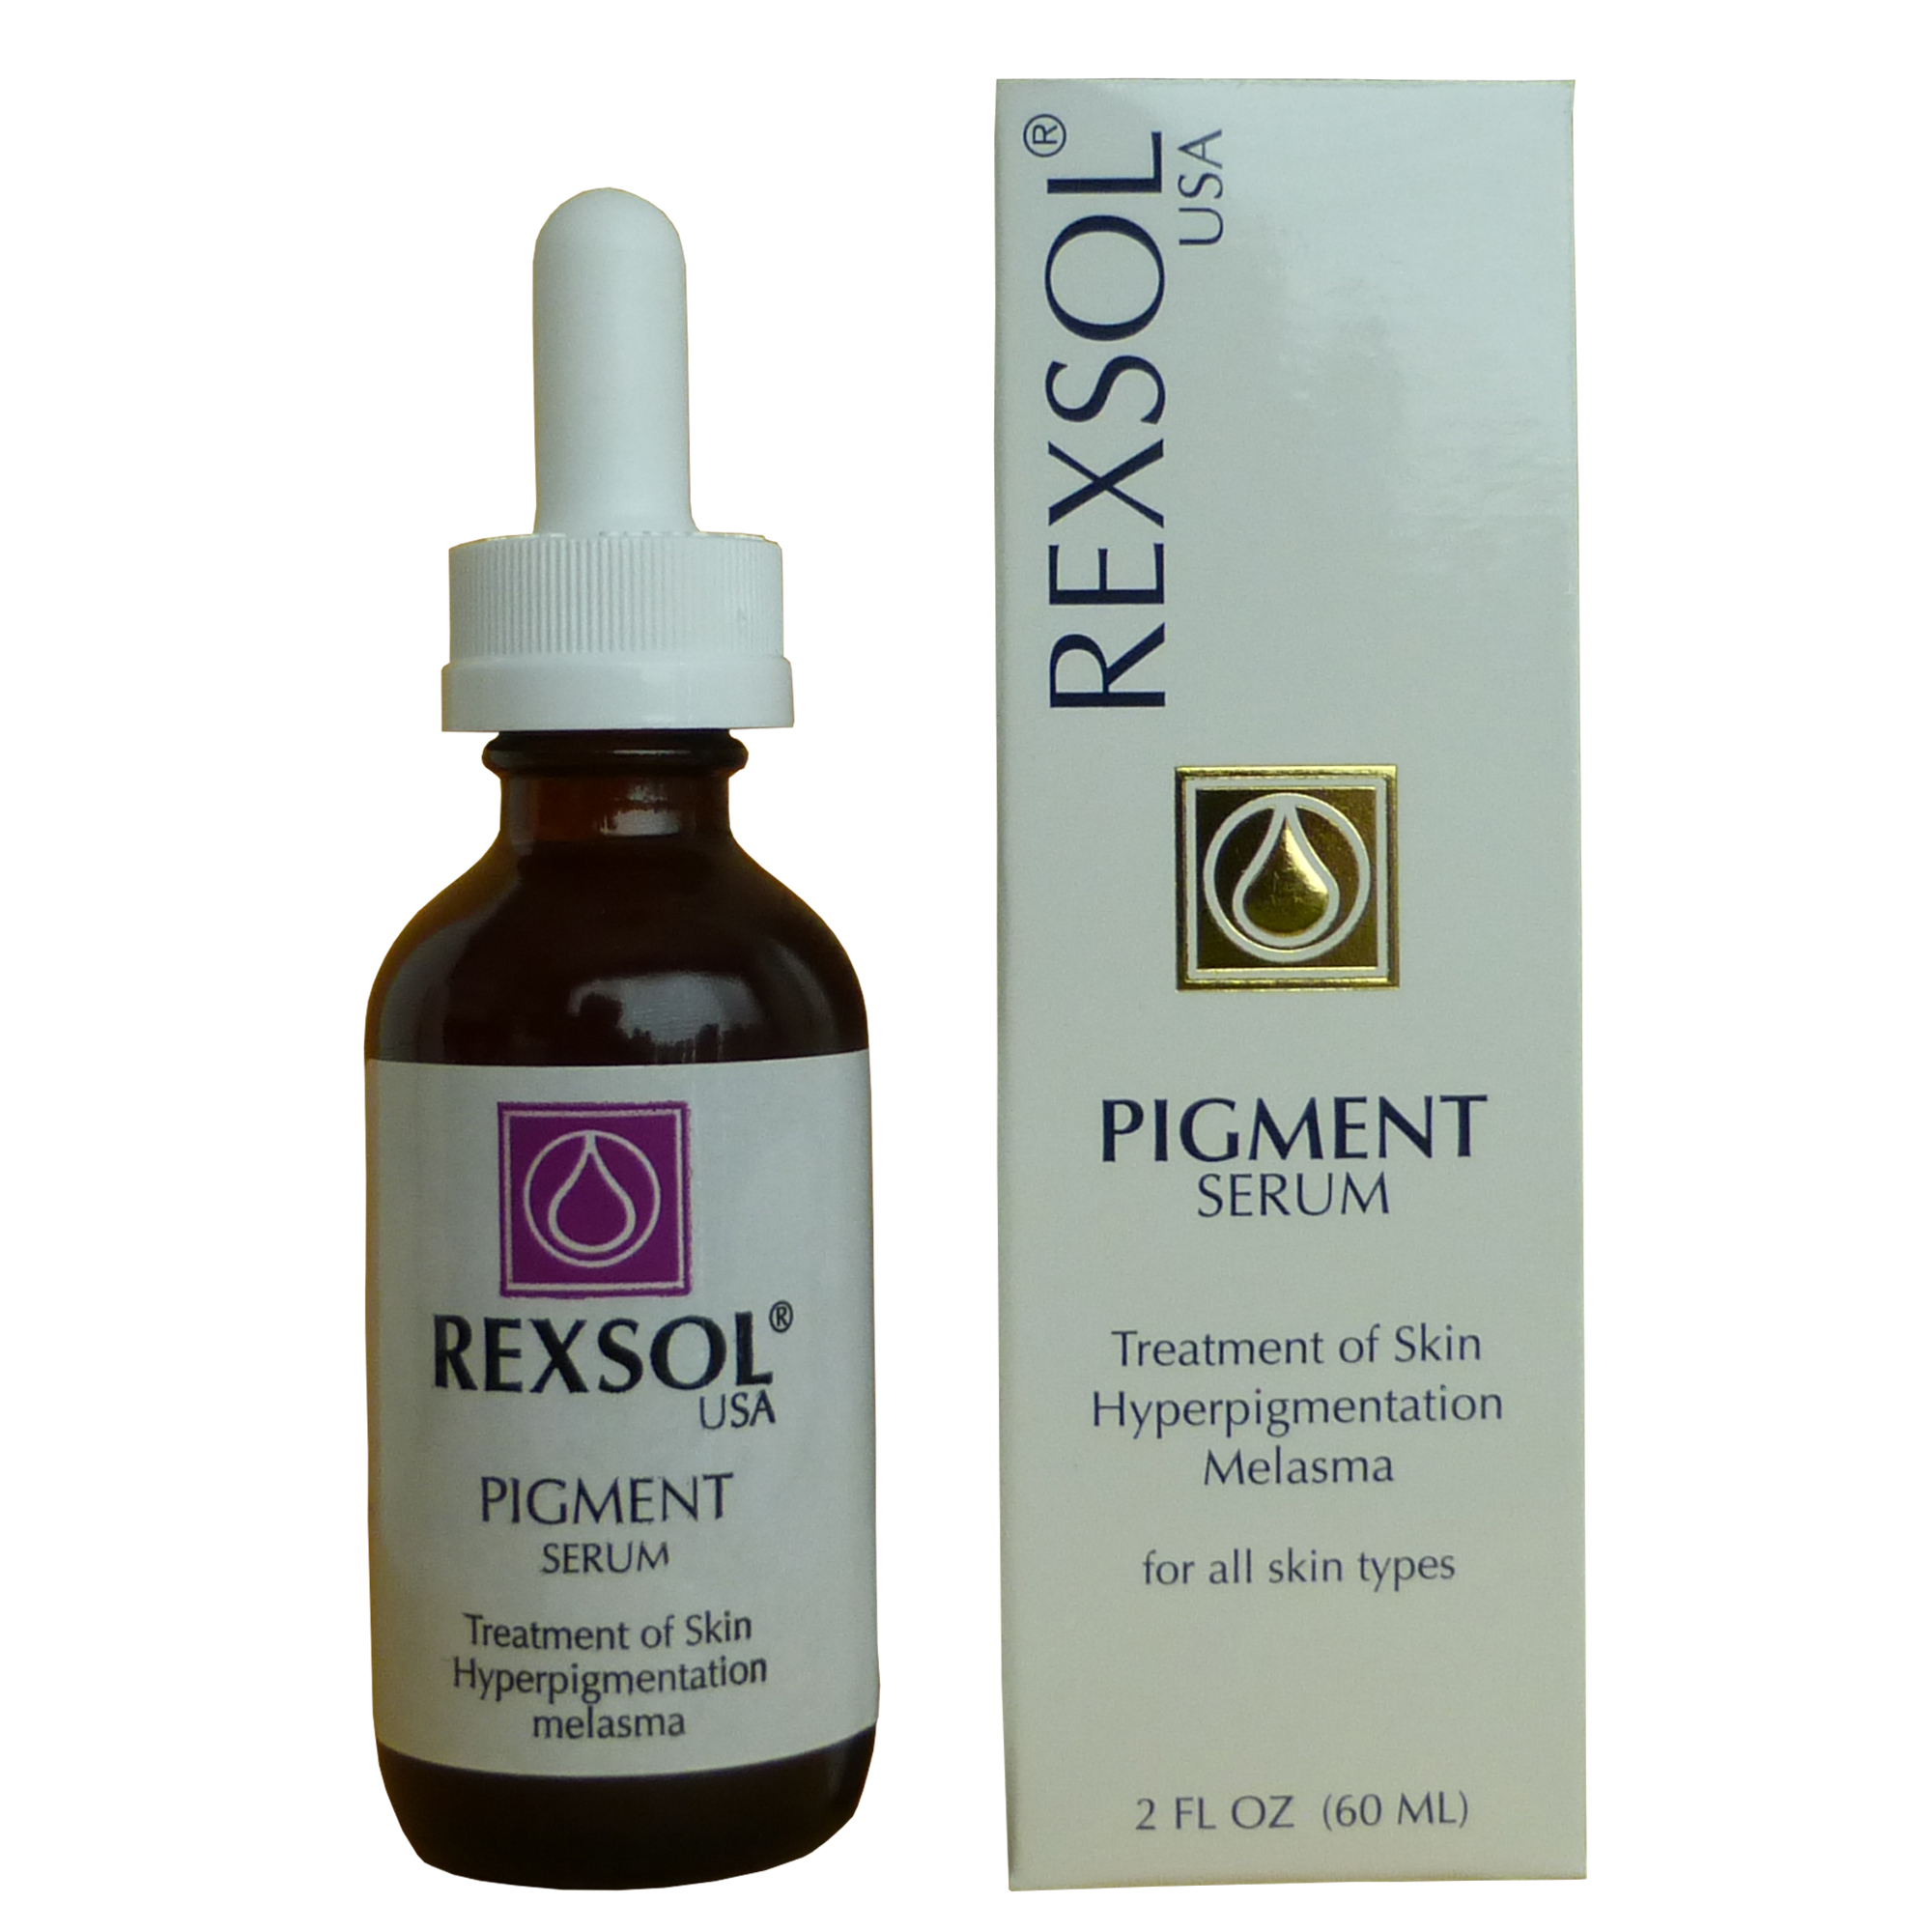 pigment serum - with--